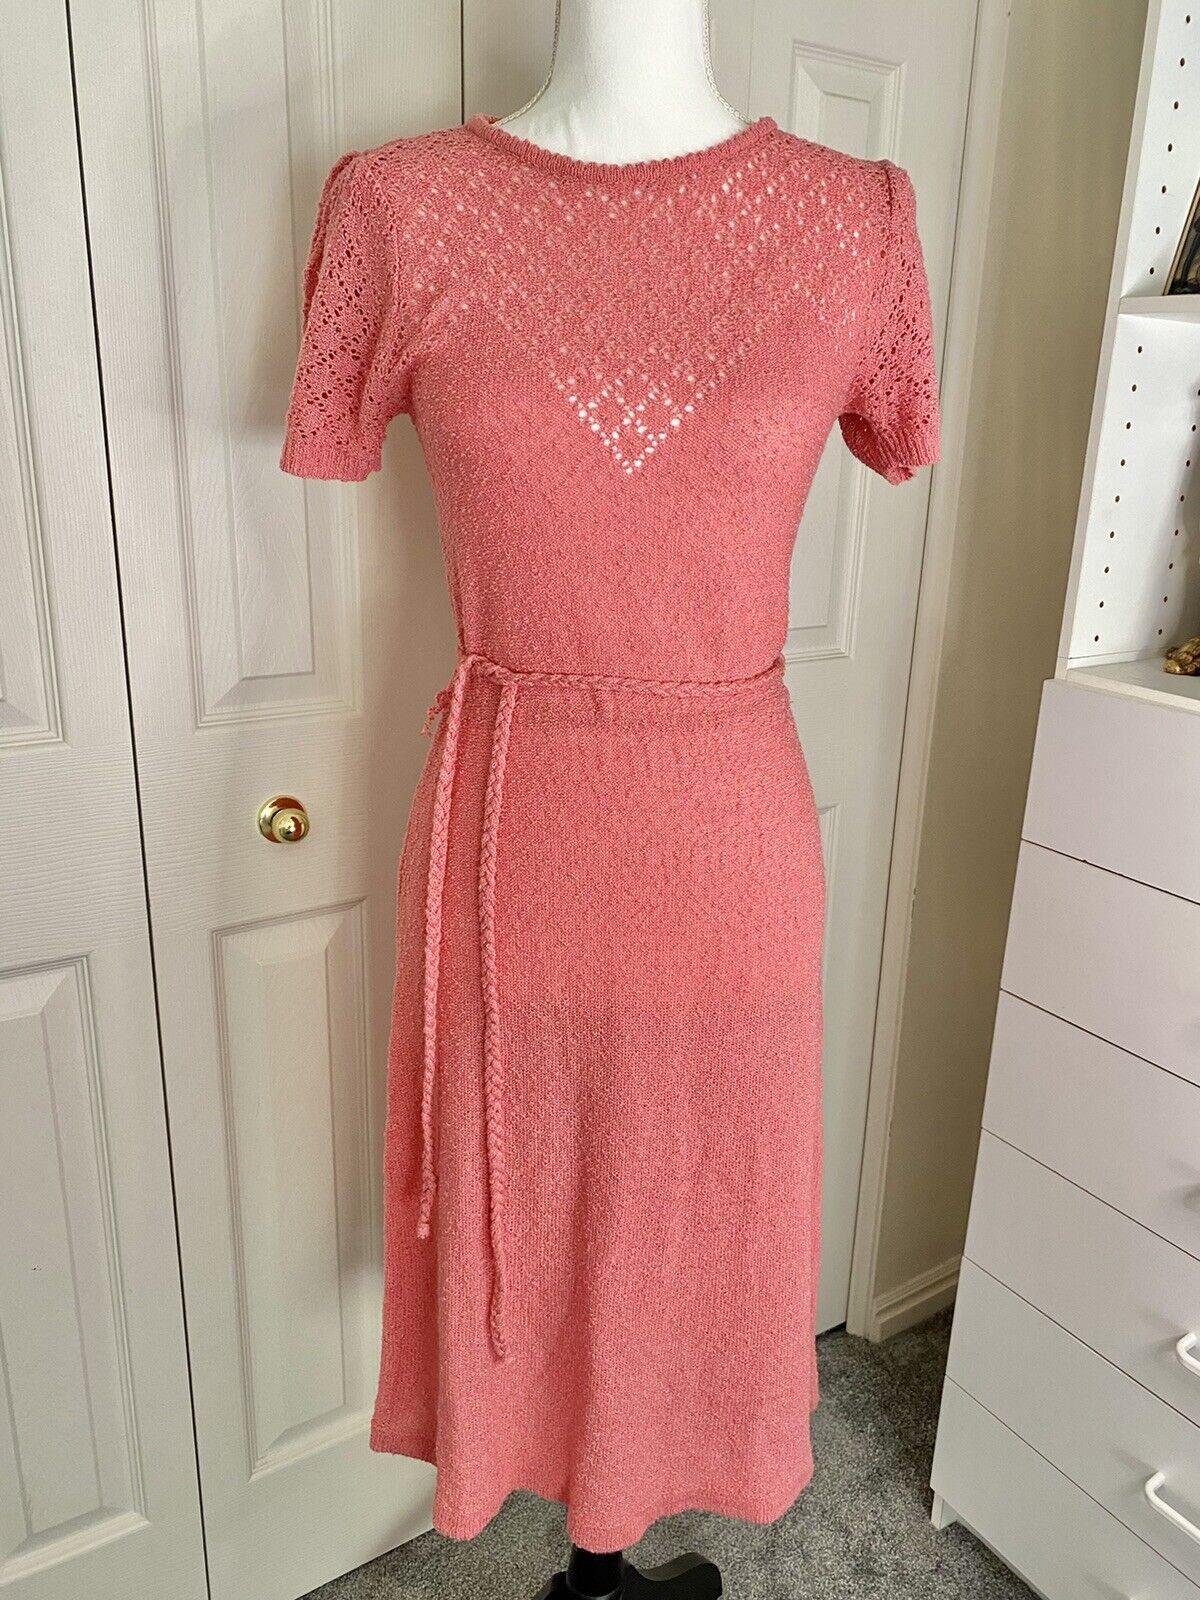 Vintage 1980's Dress, MS II, Women's Size M Petit… - image 1